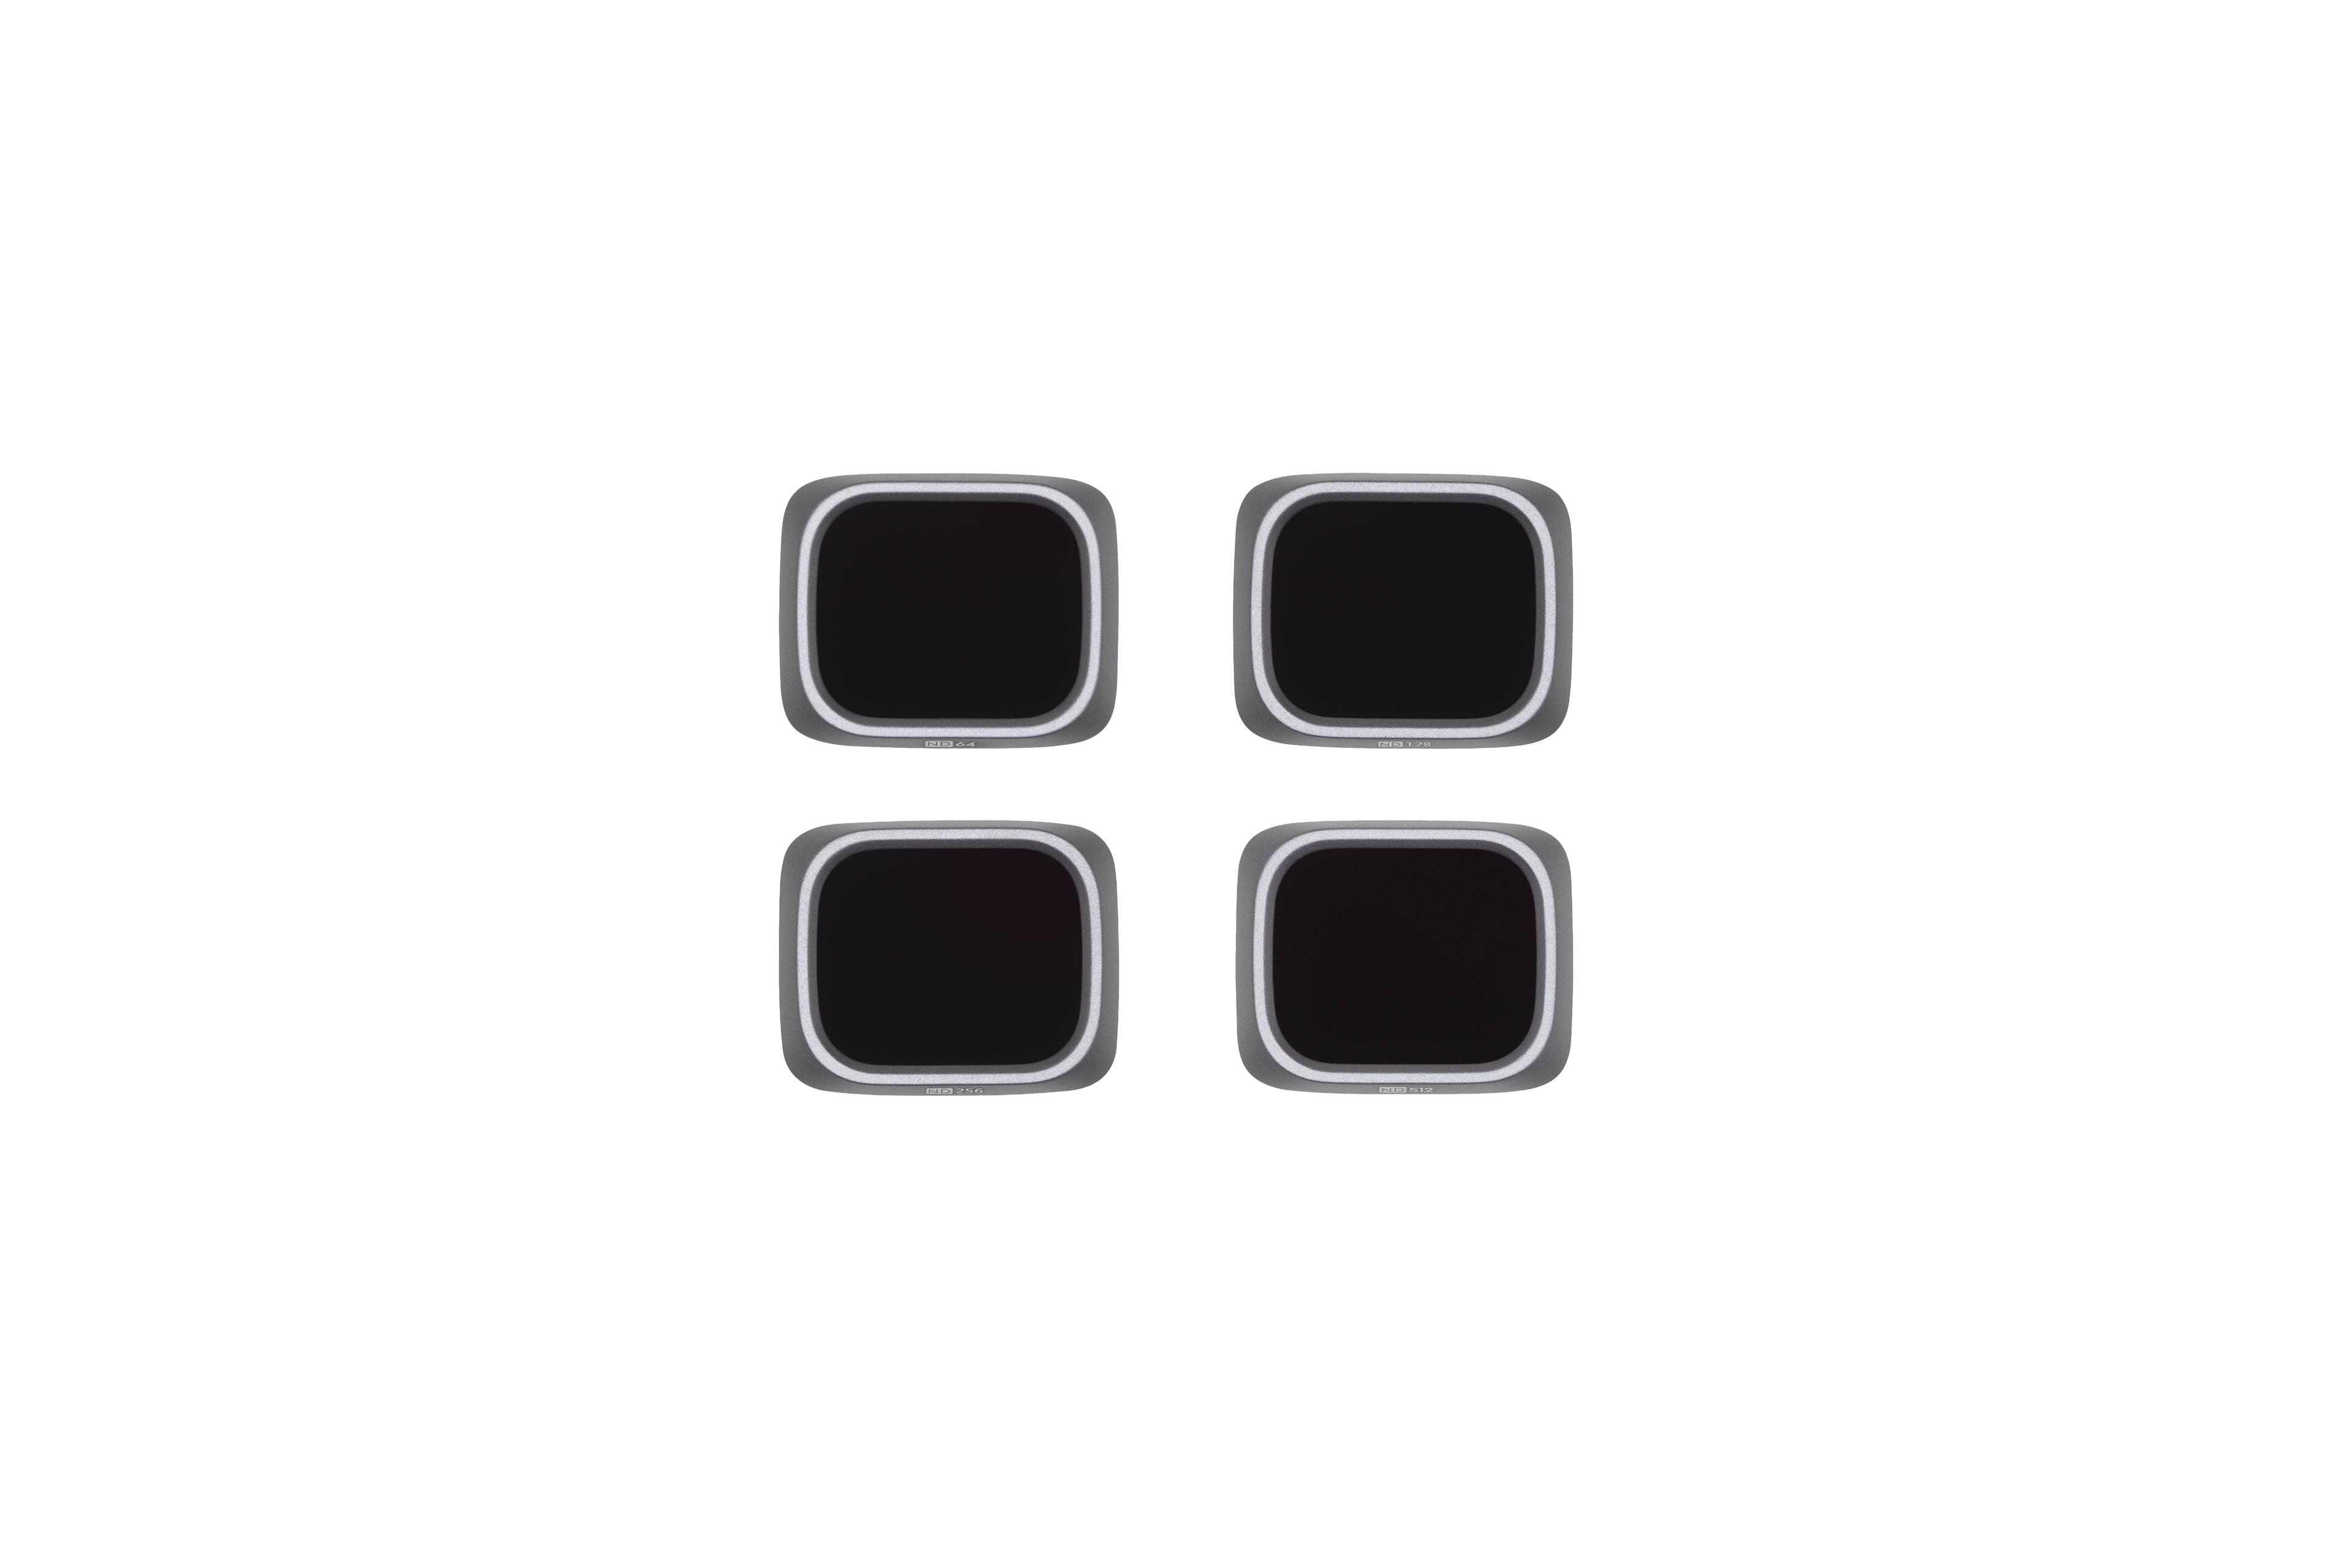 DJI - DJI AIR 2S ND Filters Set (ND64/128/256/512)